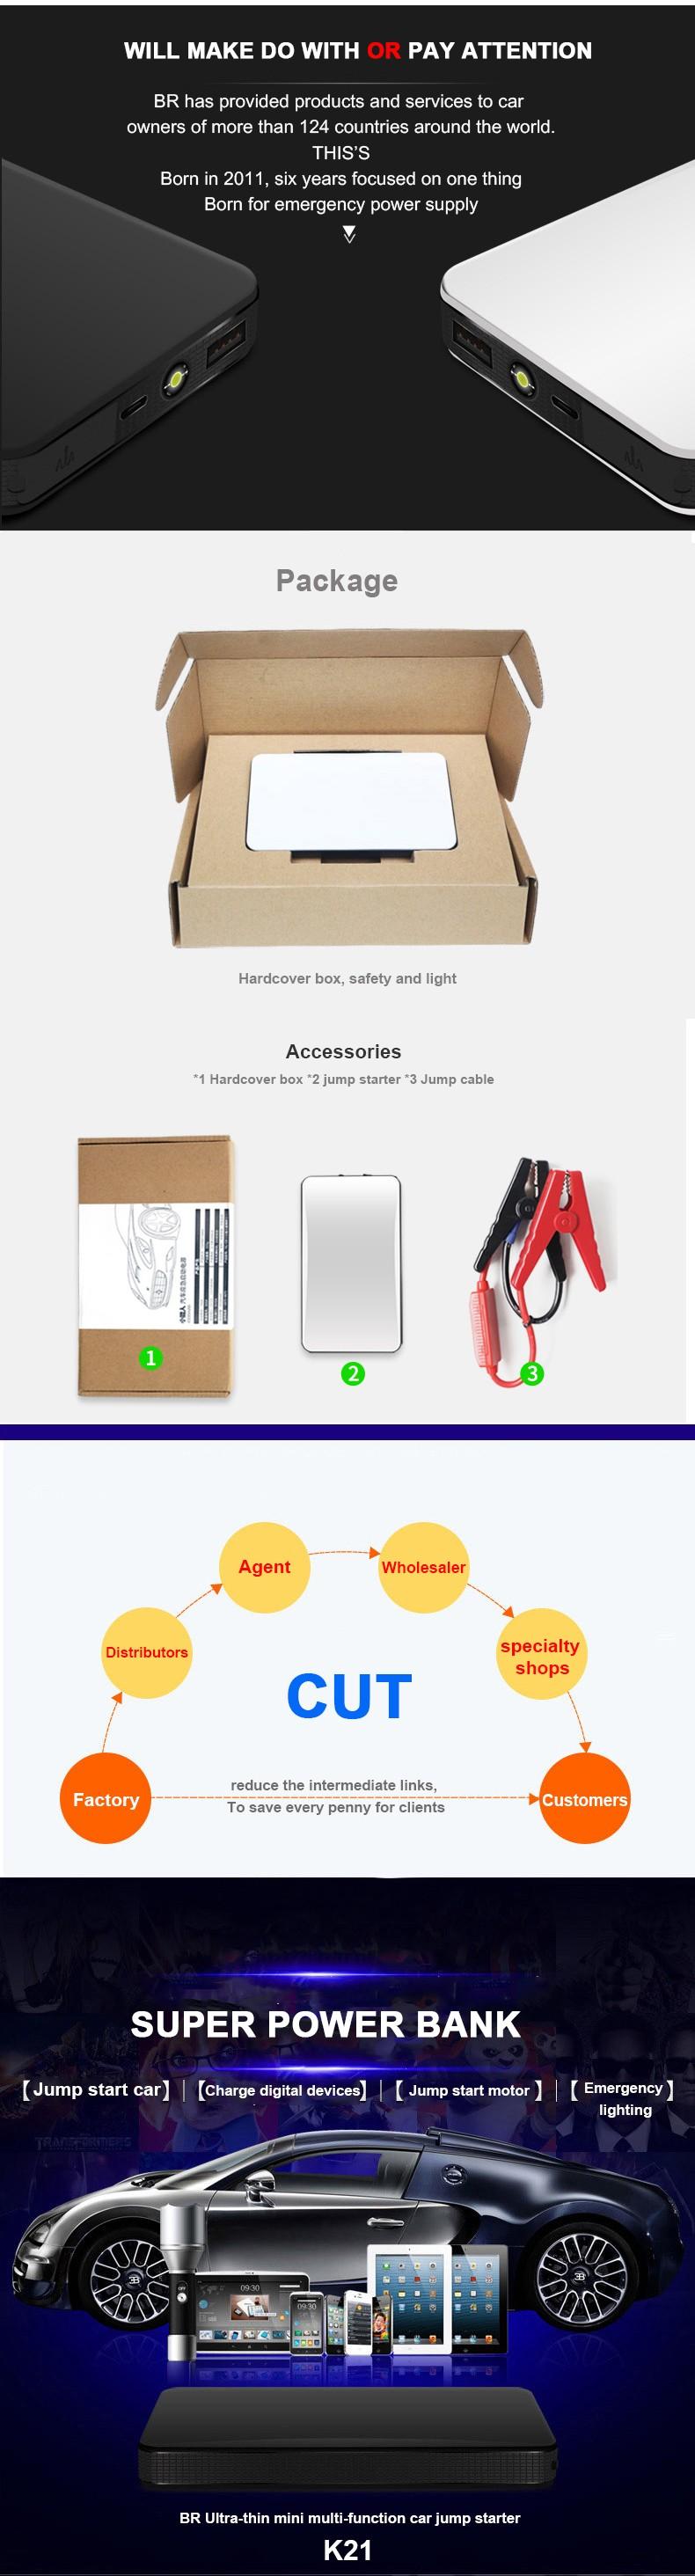 Multifunction Car Jump Starter Mini Emergency Charger Battery Booster Power Bank Jump Starter for 12V gasoline Car